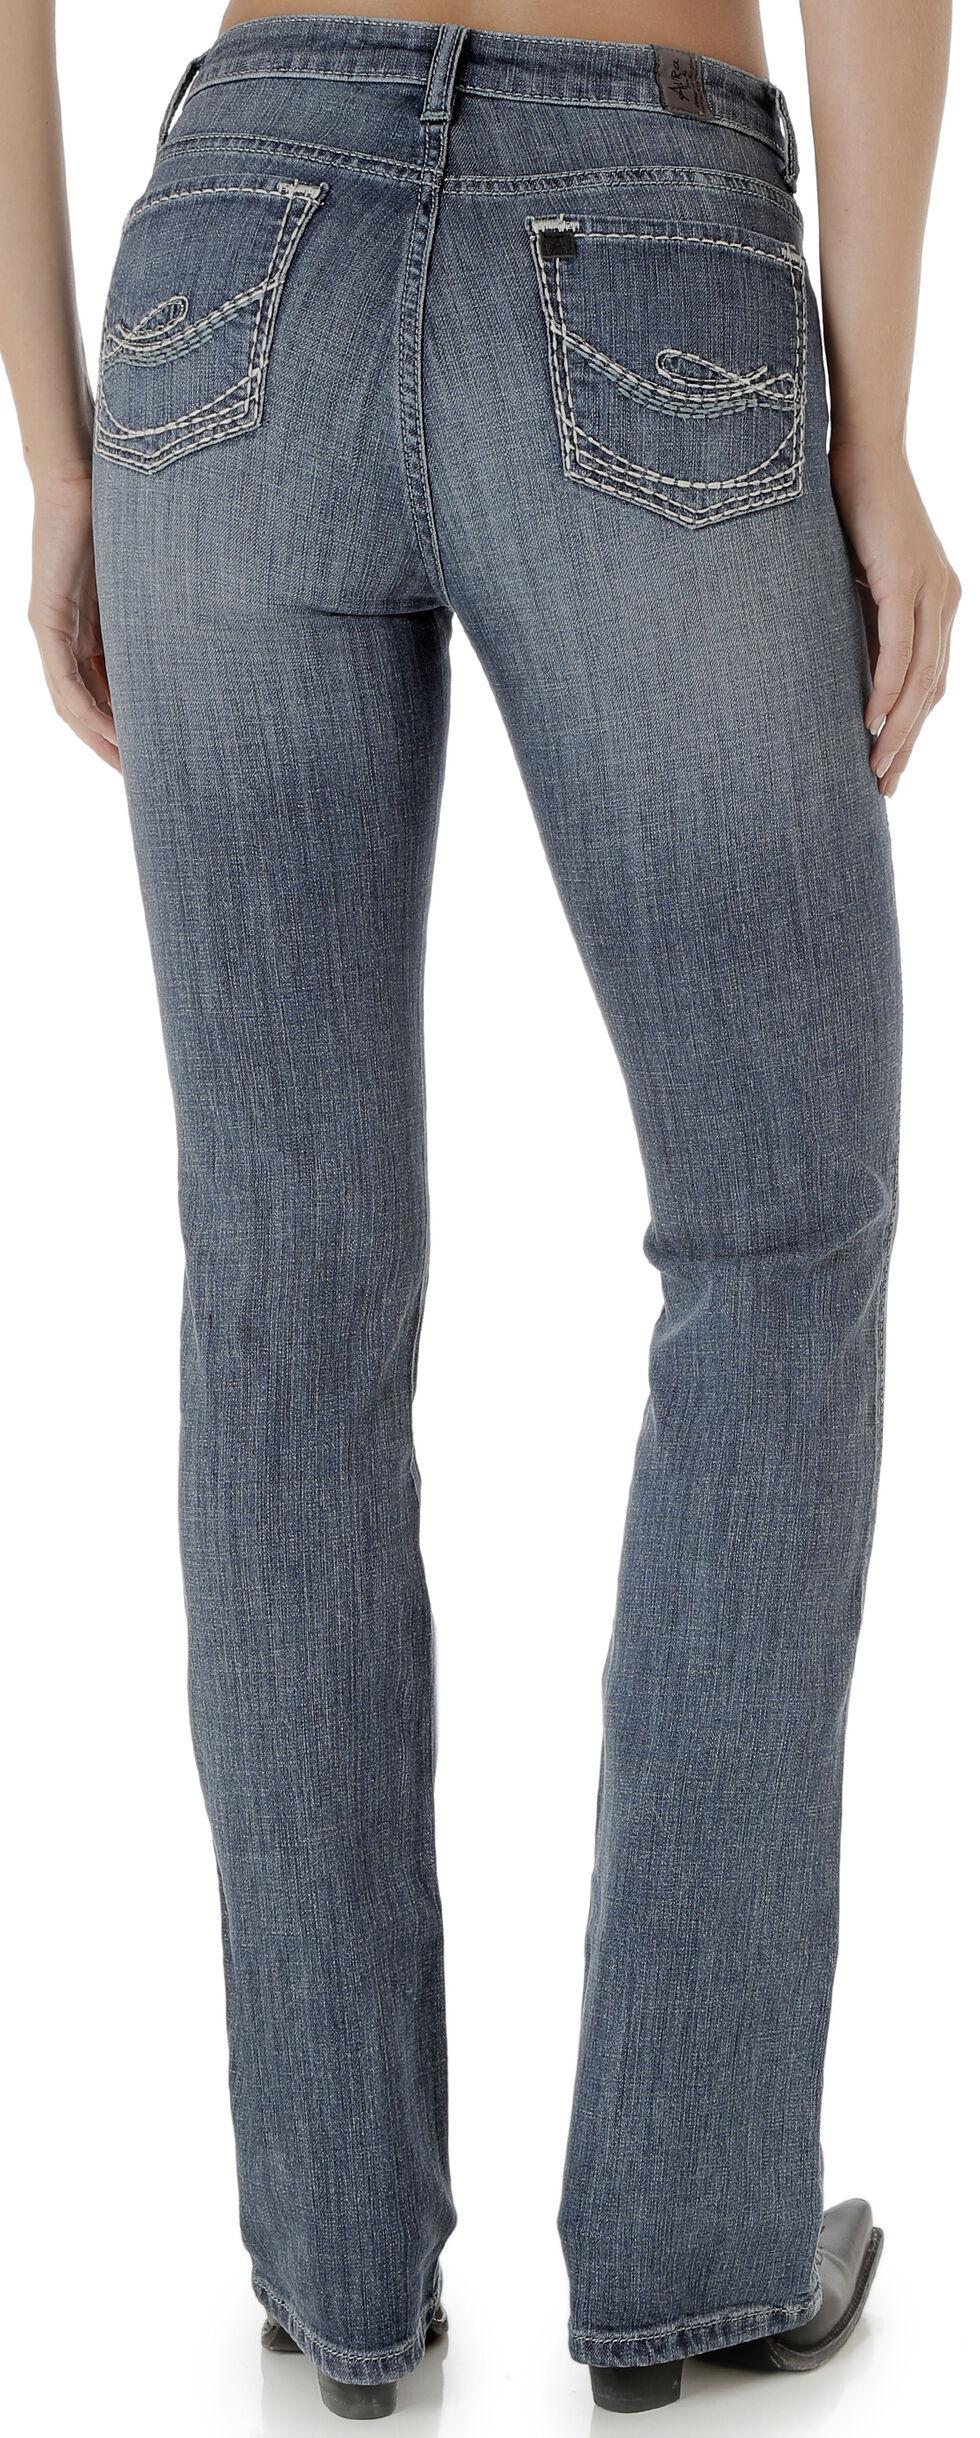 Wrangler Women's Vintage Rinse Aura Instantly Slimming Jeans, , hi-res